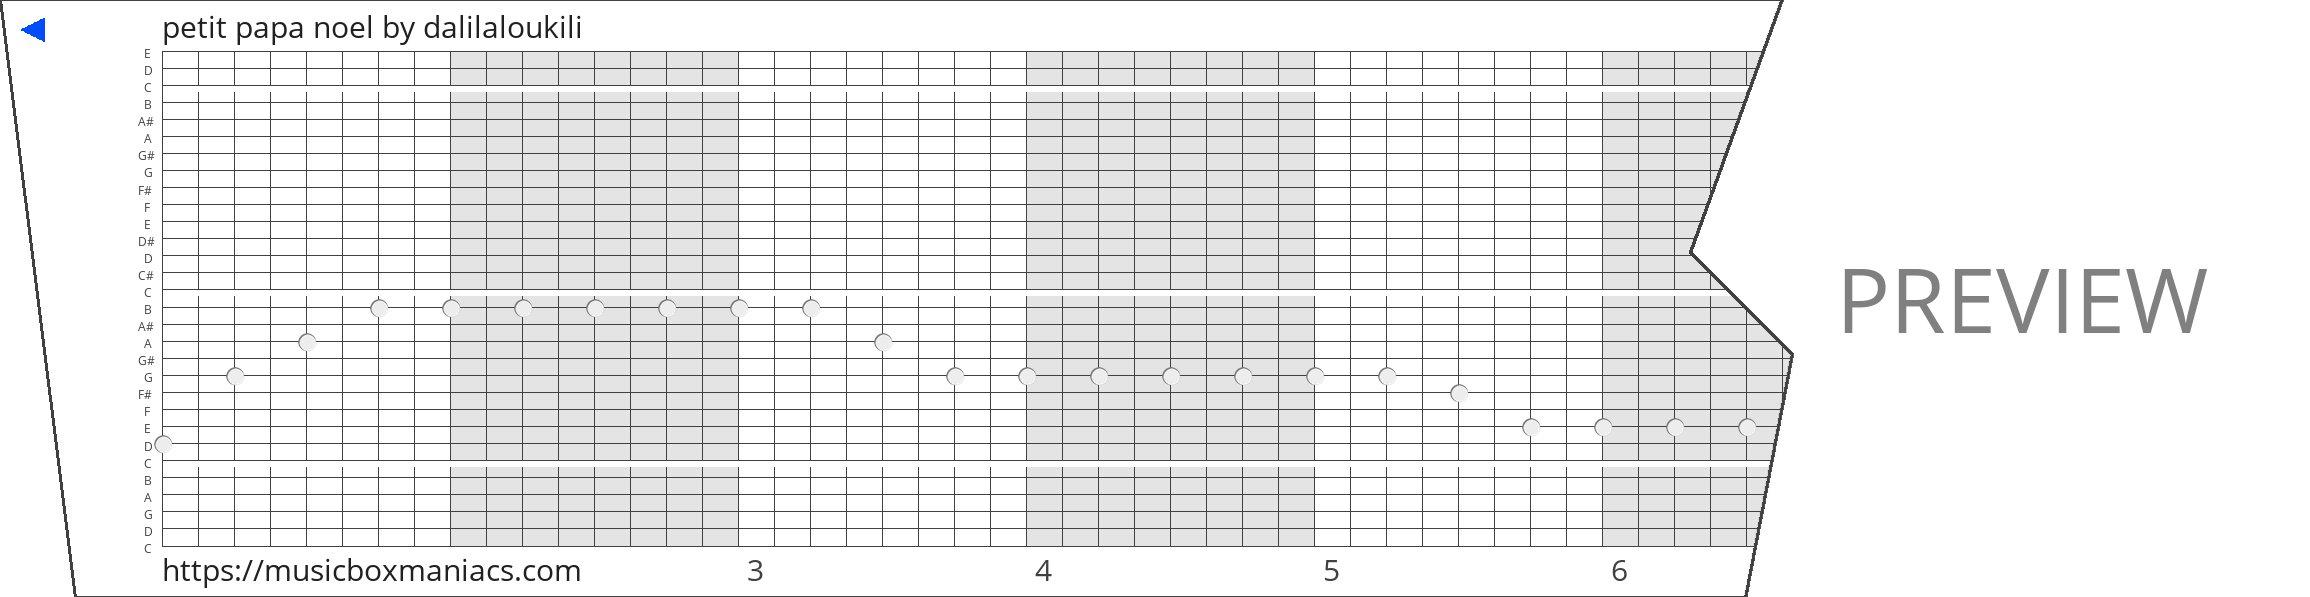 petit papa noel 30 note music box paper strip